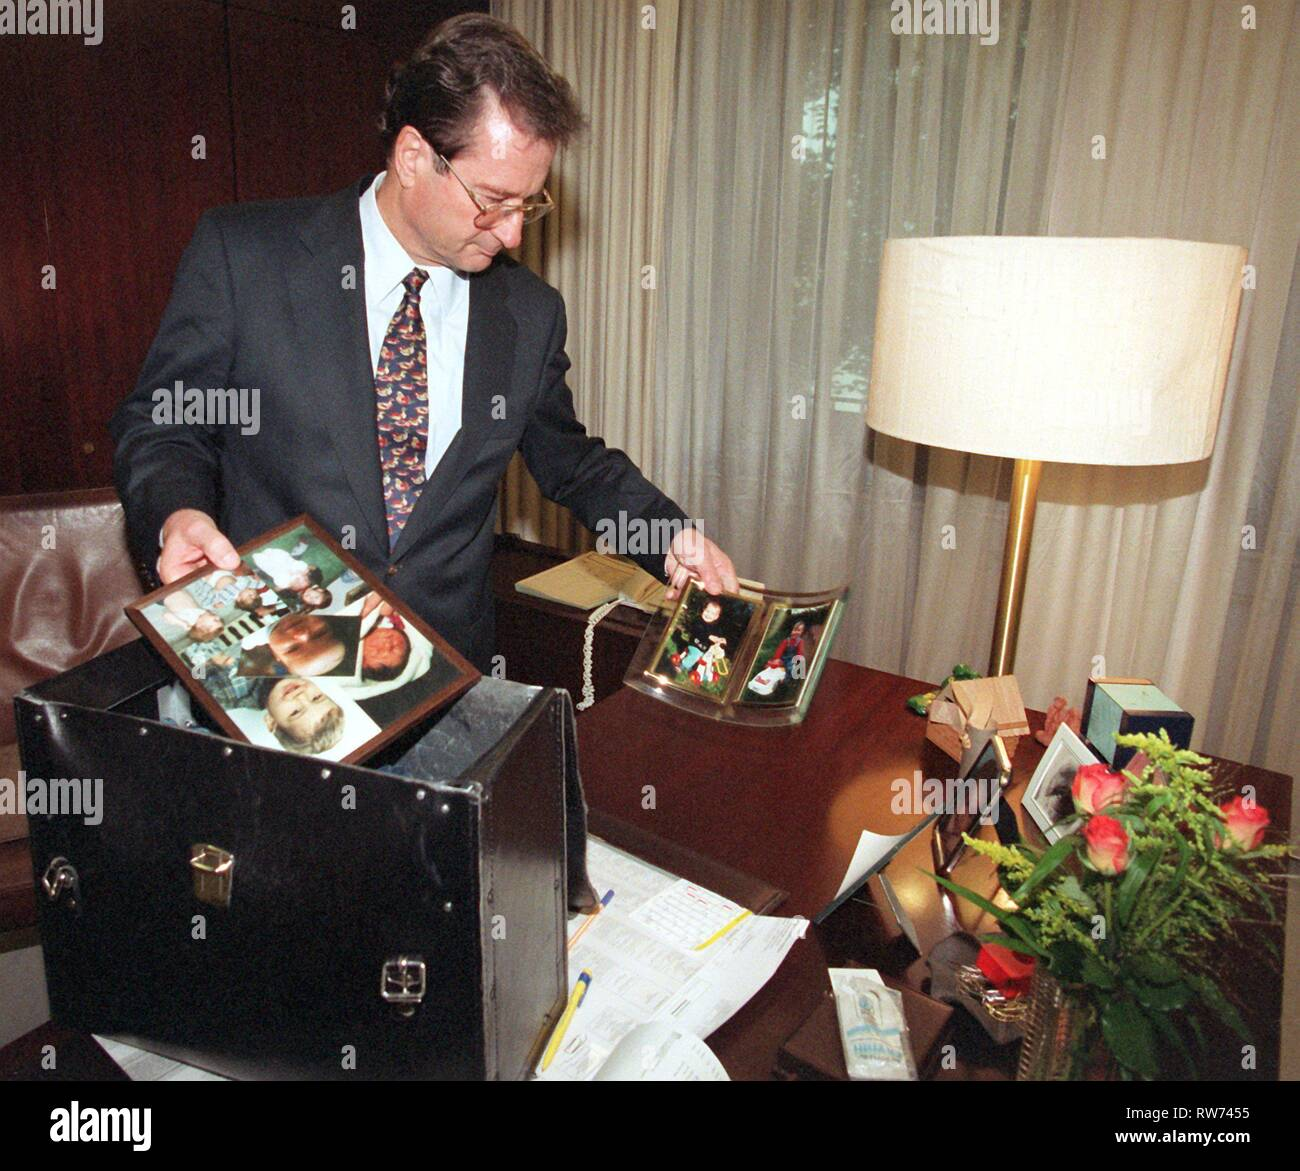 1992 1998 Stock Photos & 1992 1998 Stock Images - Alamy